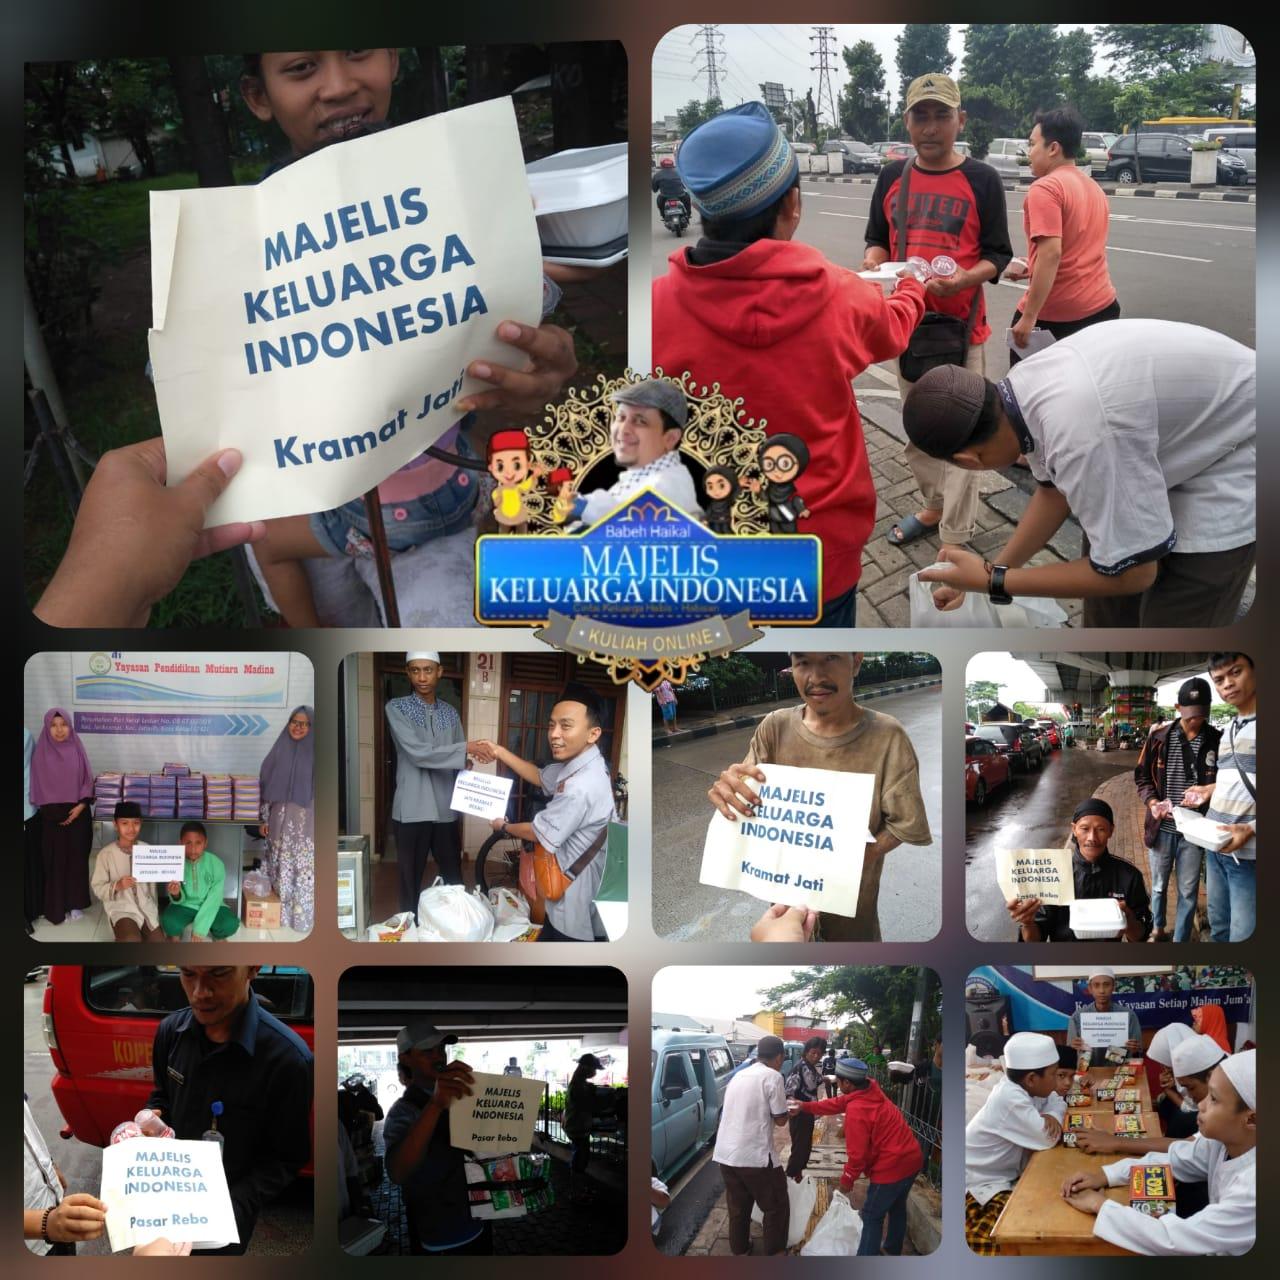 Ustadz Haikal Hassan dan Majelis Keluarga Indonesia Bagikan 500 Bungkus Nasi